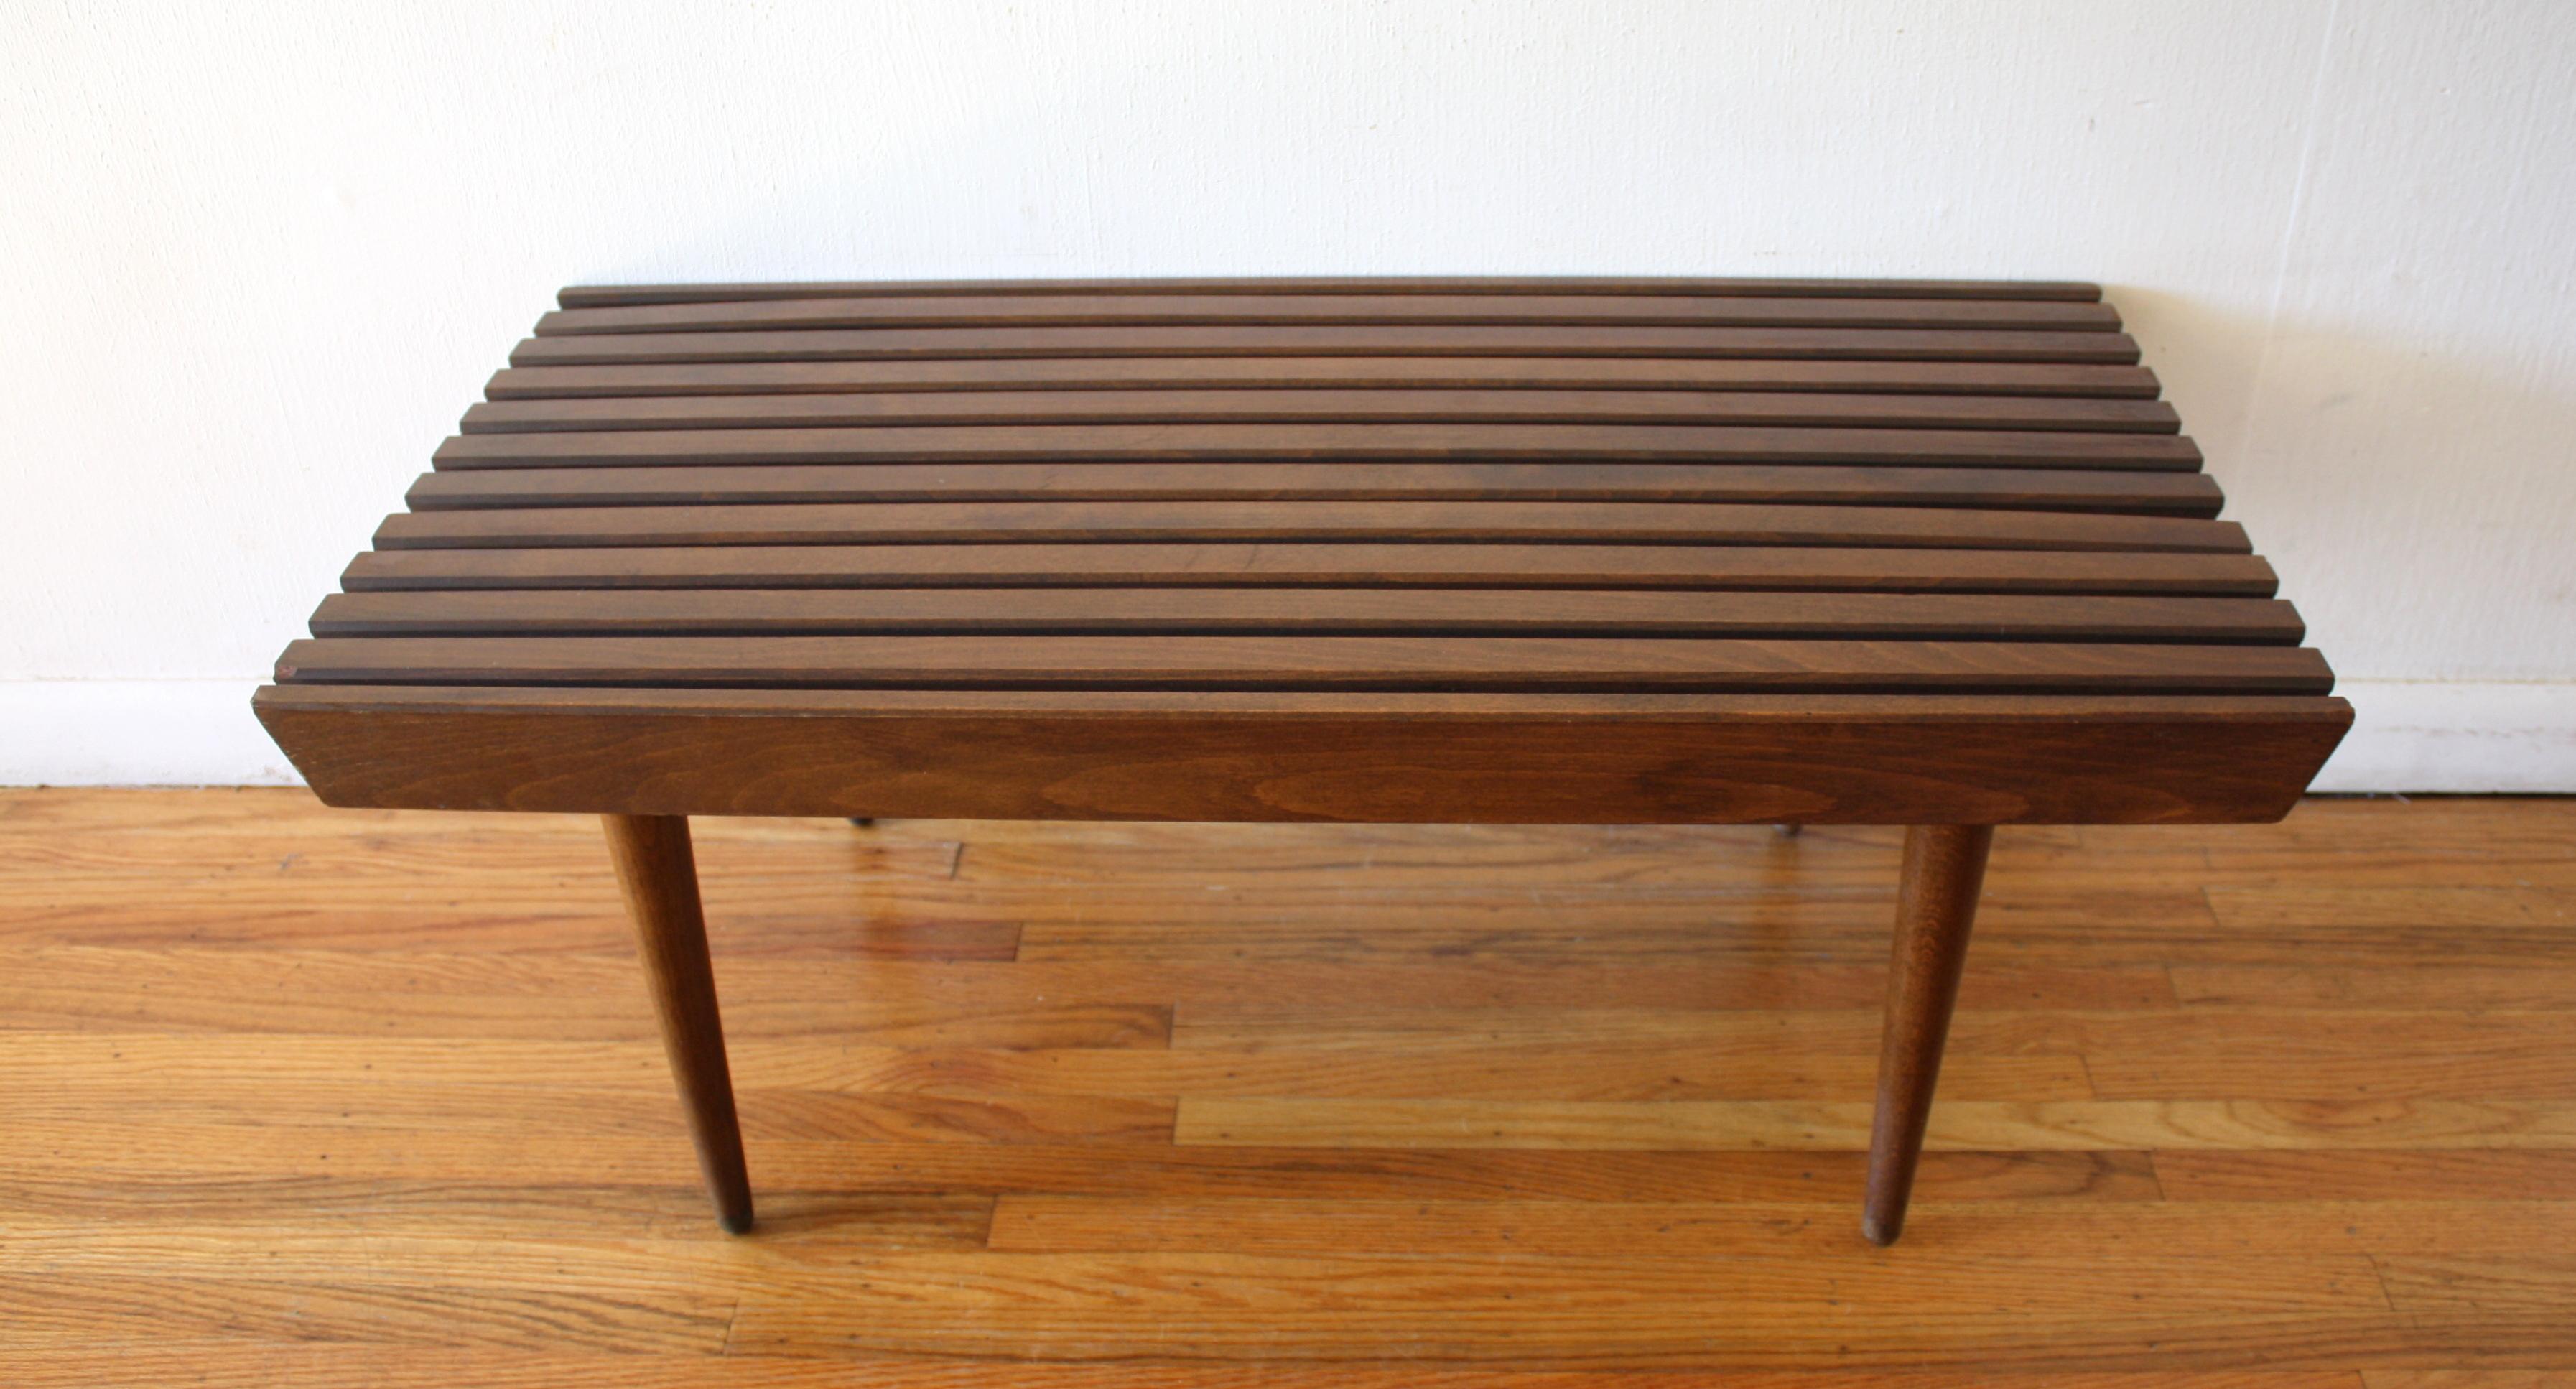 Mcm 36 Slatted Bench Table 2 Picked Vintage